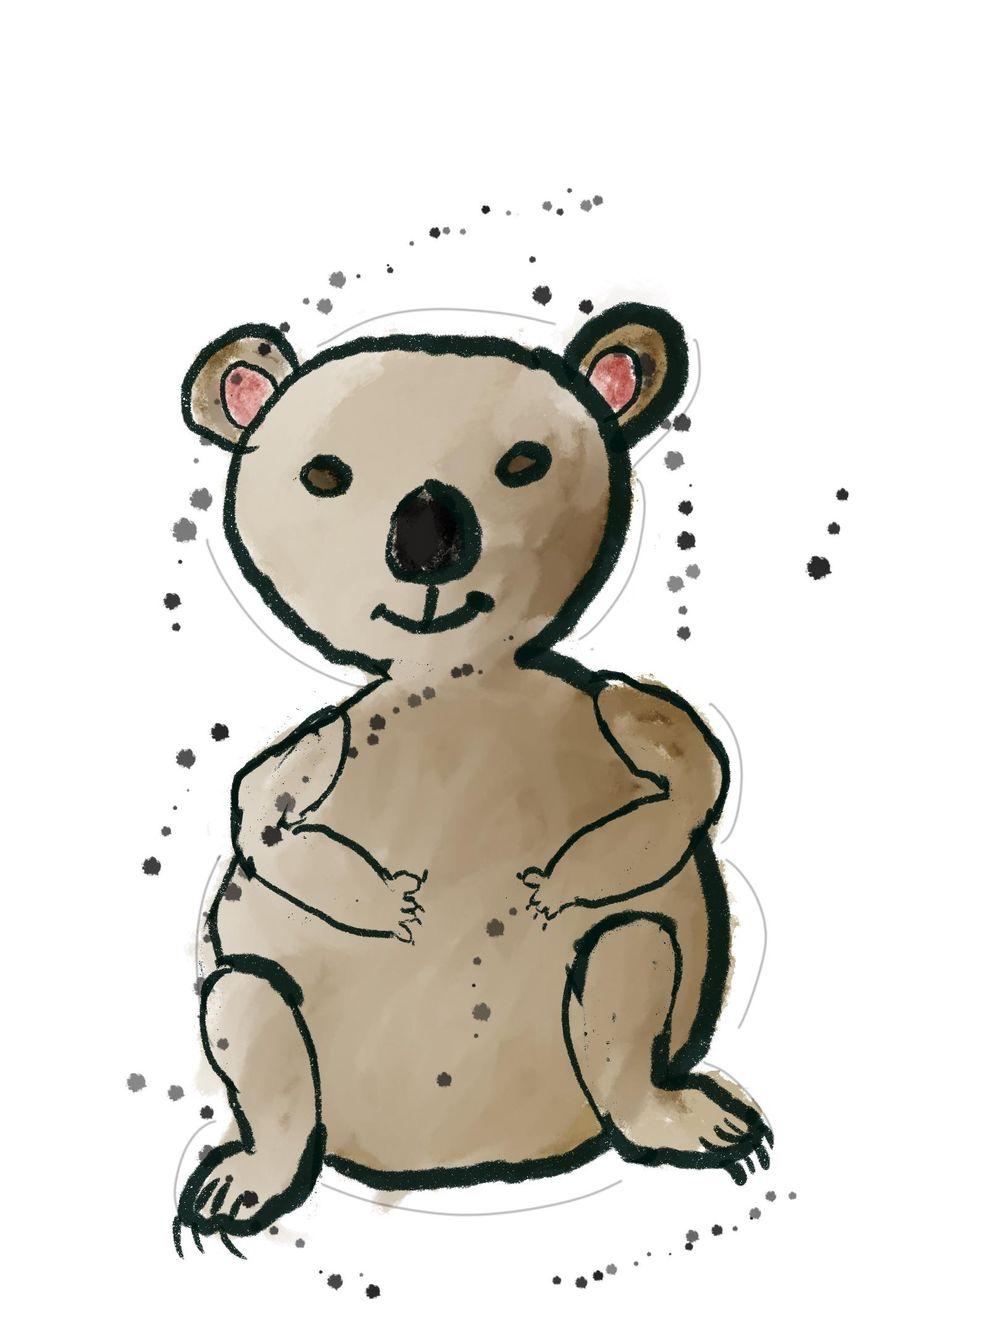 Sketchy Doodle Style Koala - image 1 - student project